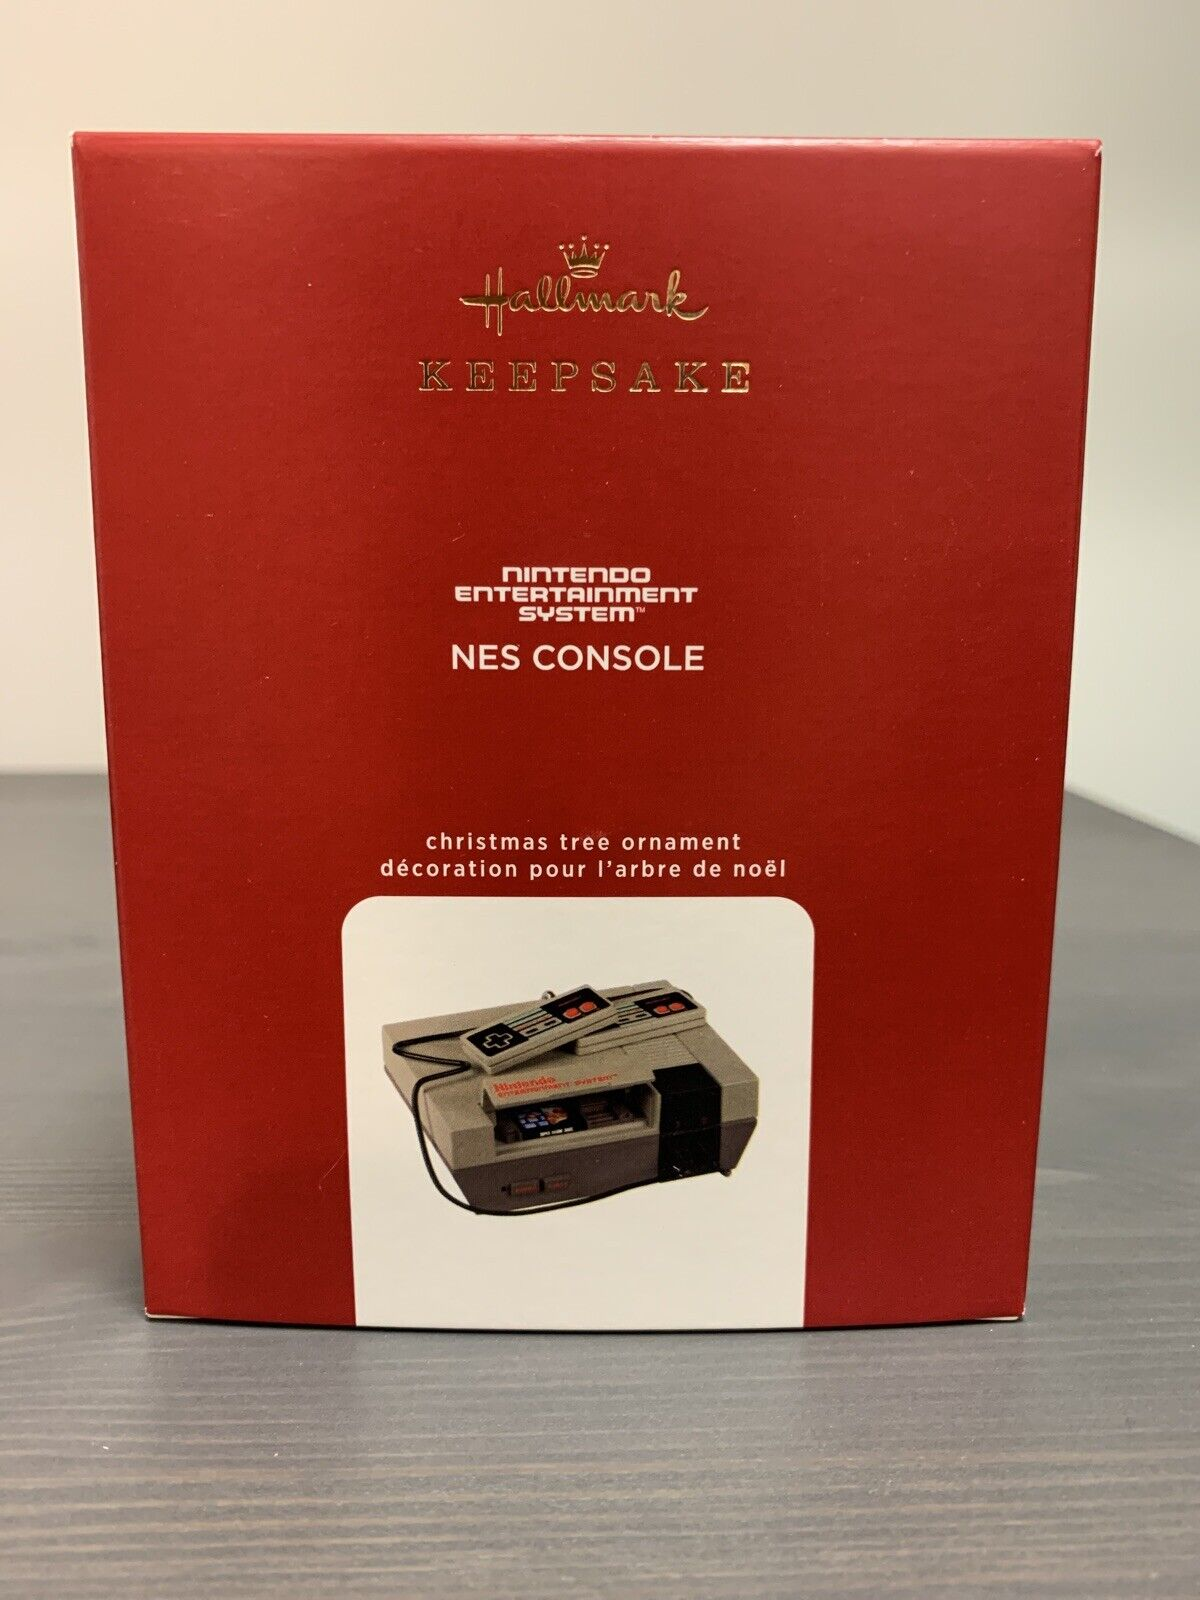 2020 Hallmark NES CONSOLE Keepsake Nintendo Entertainment System Sound See Note